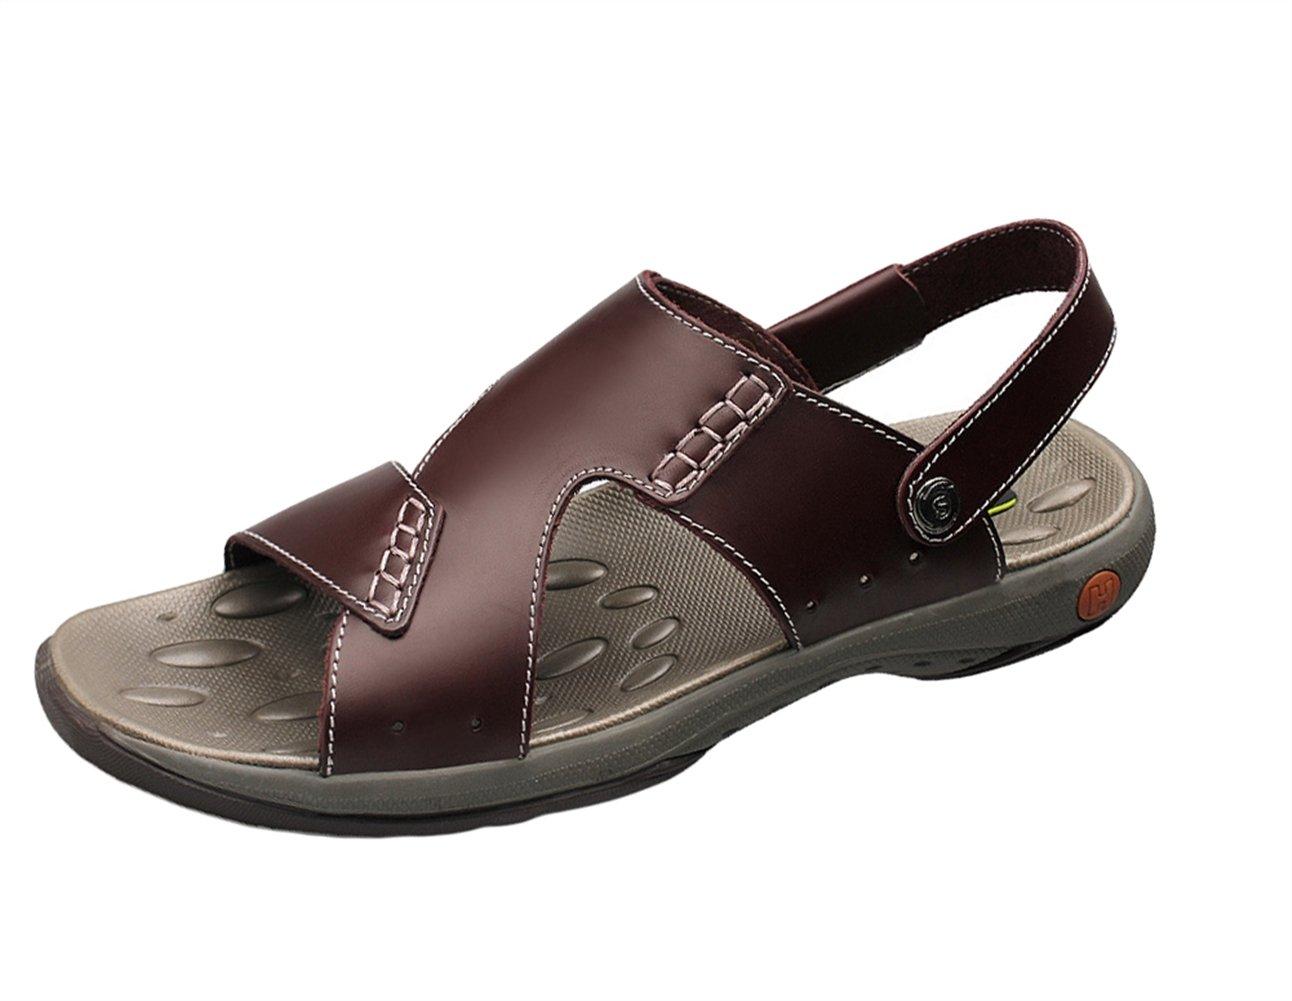 Insun Sandalias Para Hombre Cuero Casuales Sandalias Playa Zapatos 38 EU|Marrón